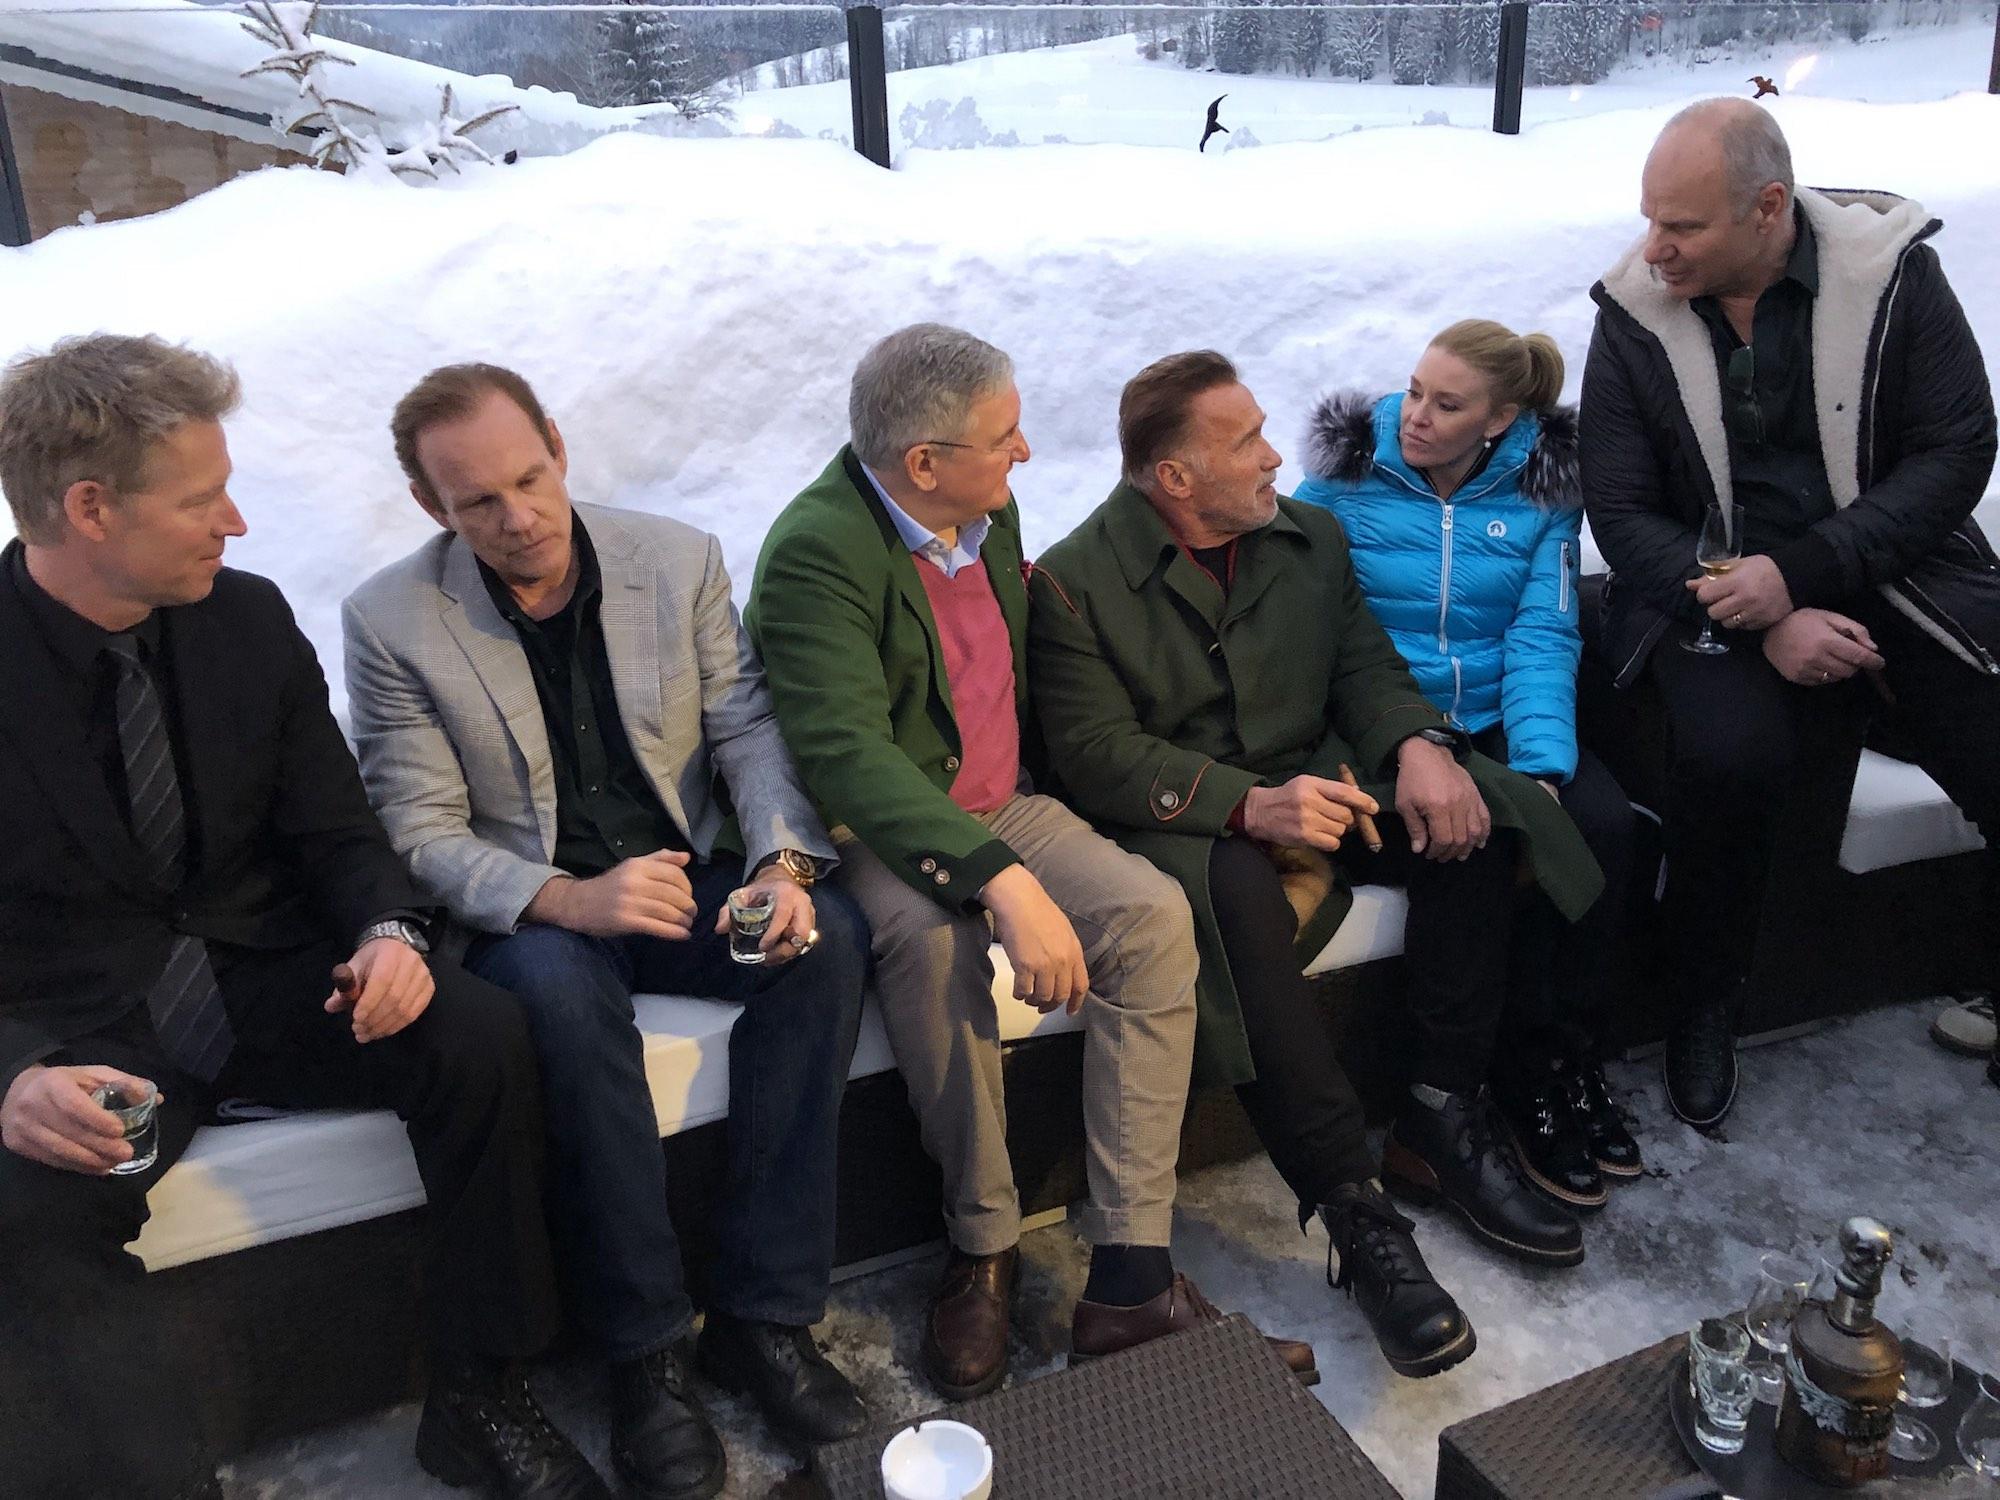 Cigar News: 2019 Daniel Marshall Campfire Event Held to Celebrate Hahnenkamm-Rennen Ski Race